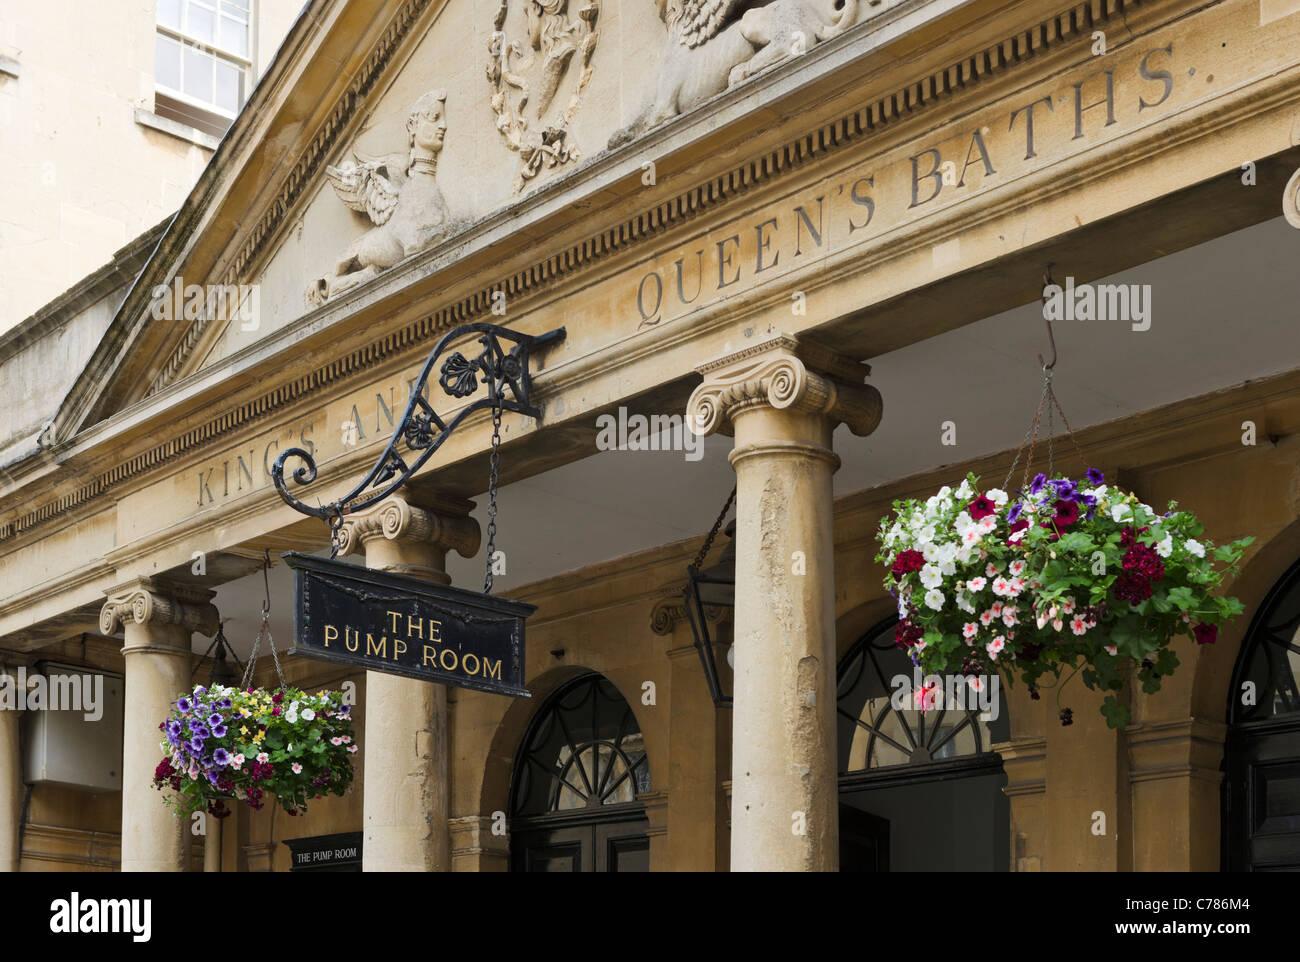 Entrance to the Pump Room and Roman Baths on Stall Street, Bath ...